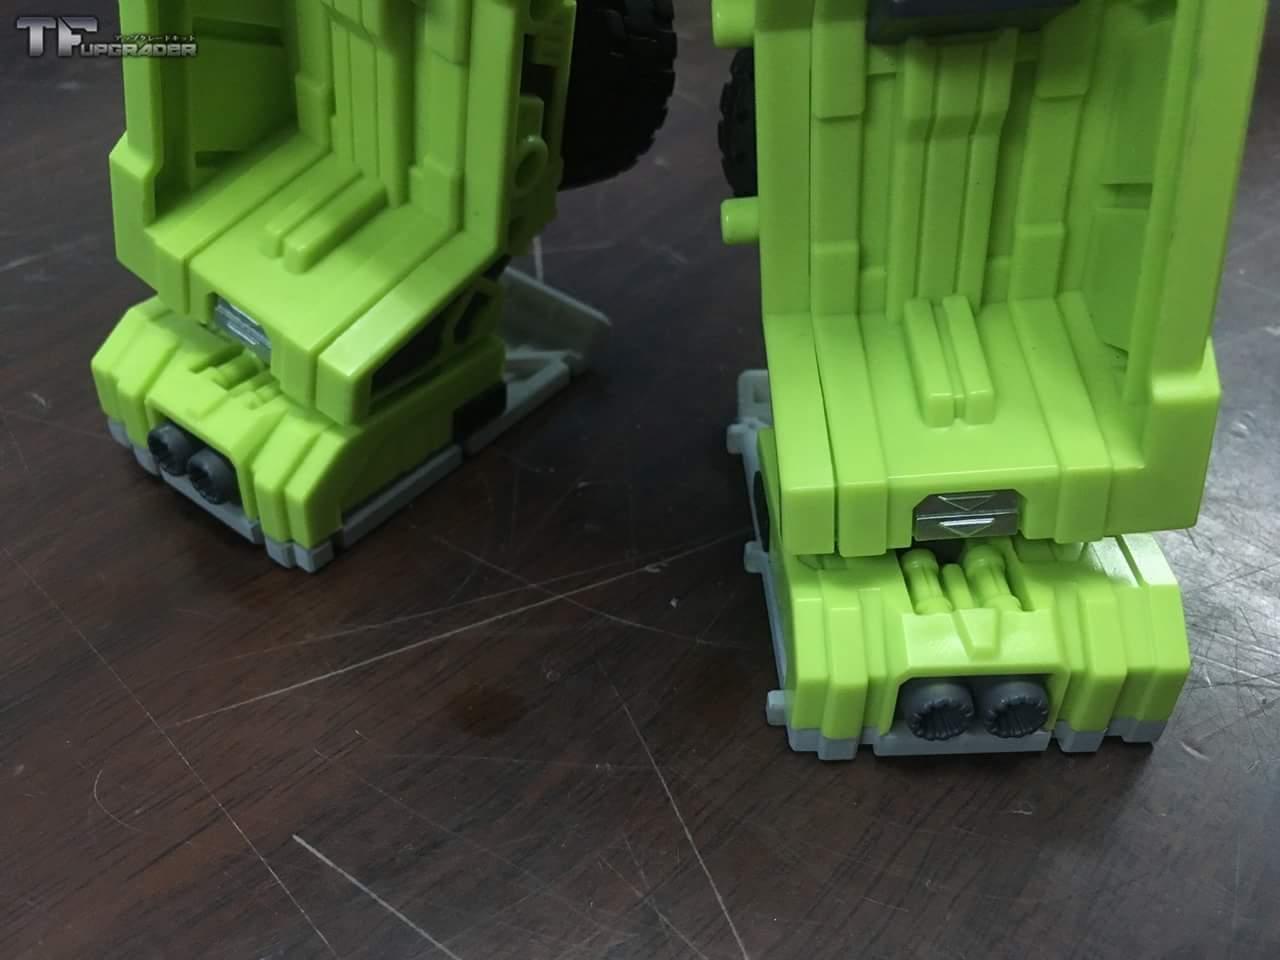 [Toyworld] Produit Tiers - Jouet TW-C Constructor aka Devastator/Dévastateur (Version vert G1 et jaune G2) - Page 8 S5LUmfjp